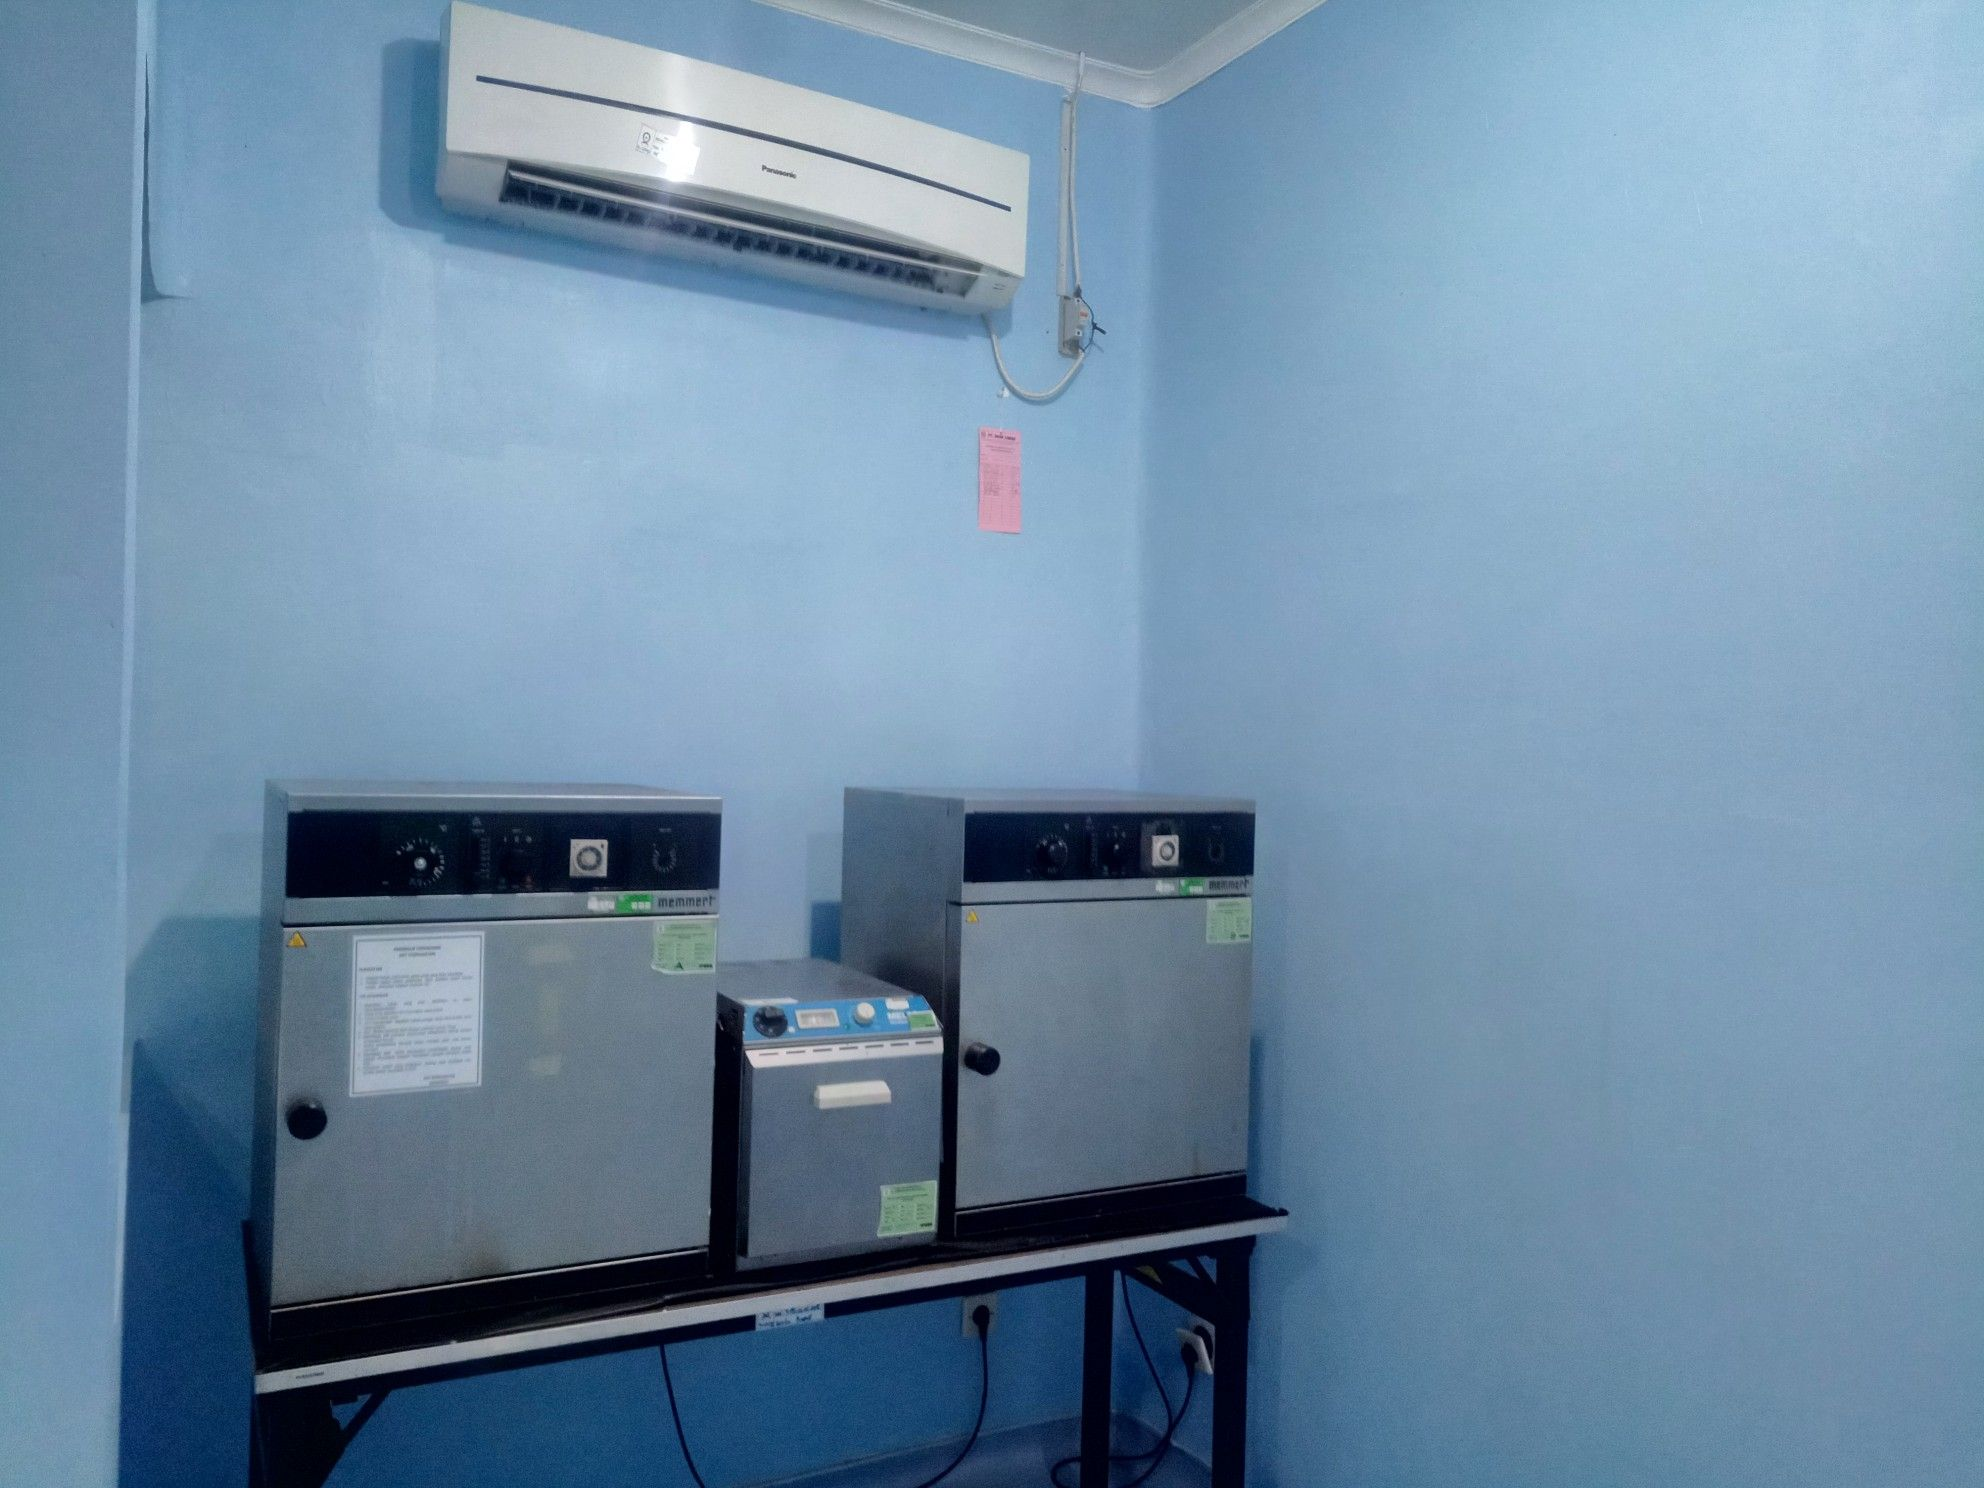 Deskripsi : Alat sterilusasi suhu tinggi I Sumber foto : dokpri RSKO